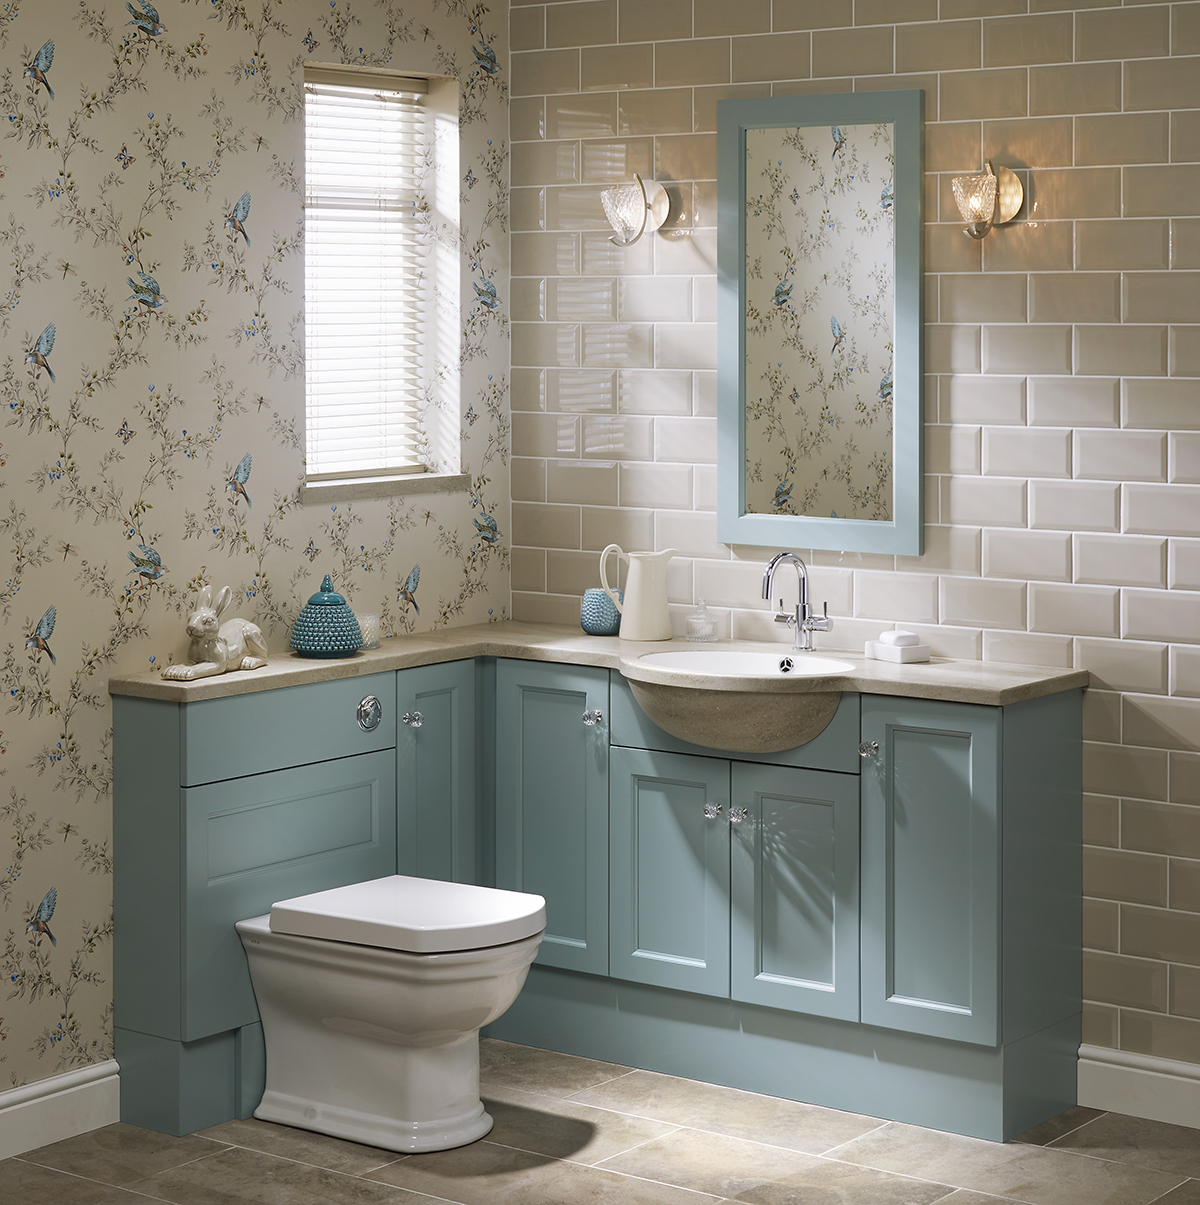 duck egg blue interior design ideas pinterest